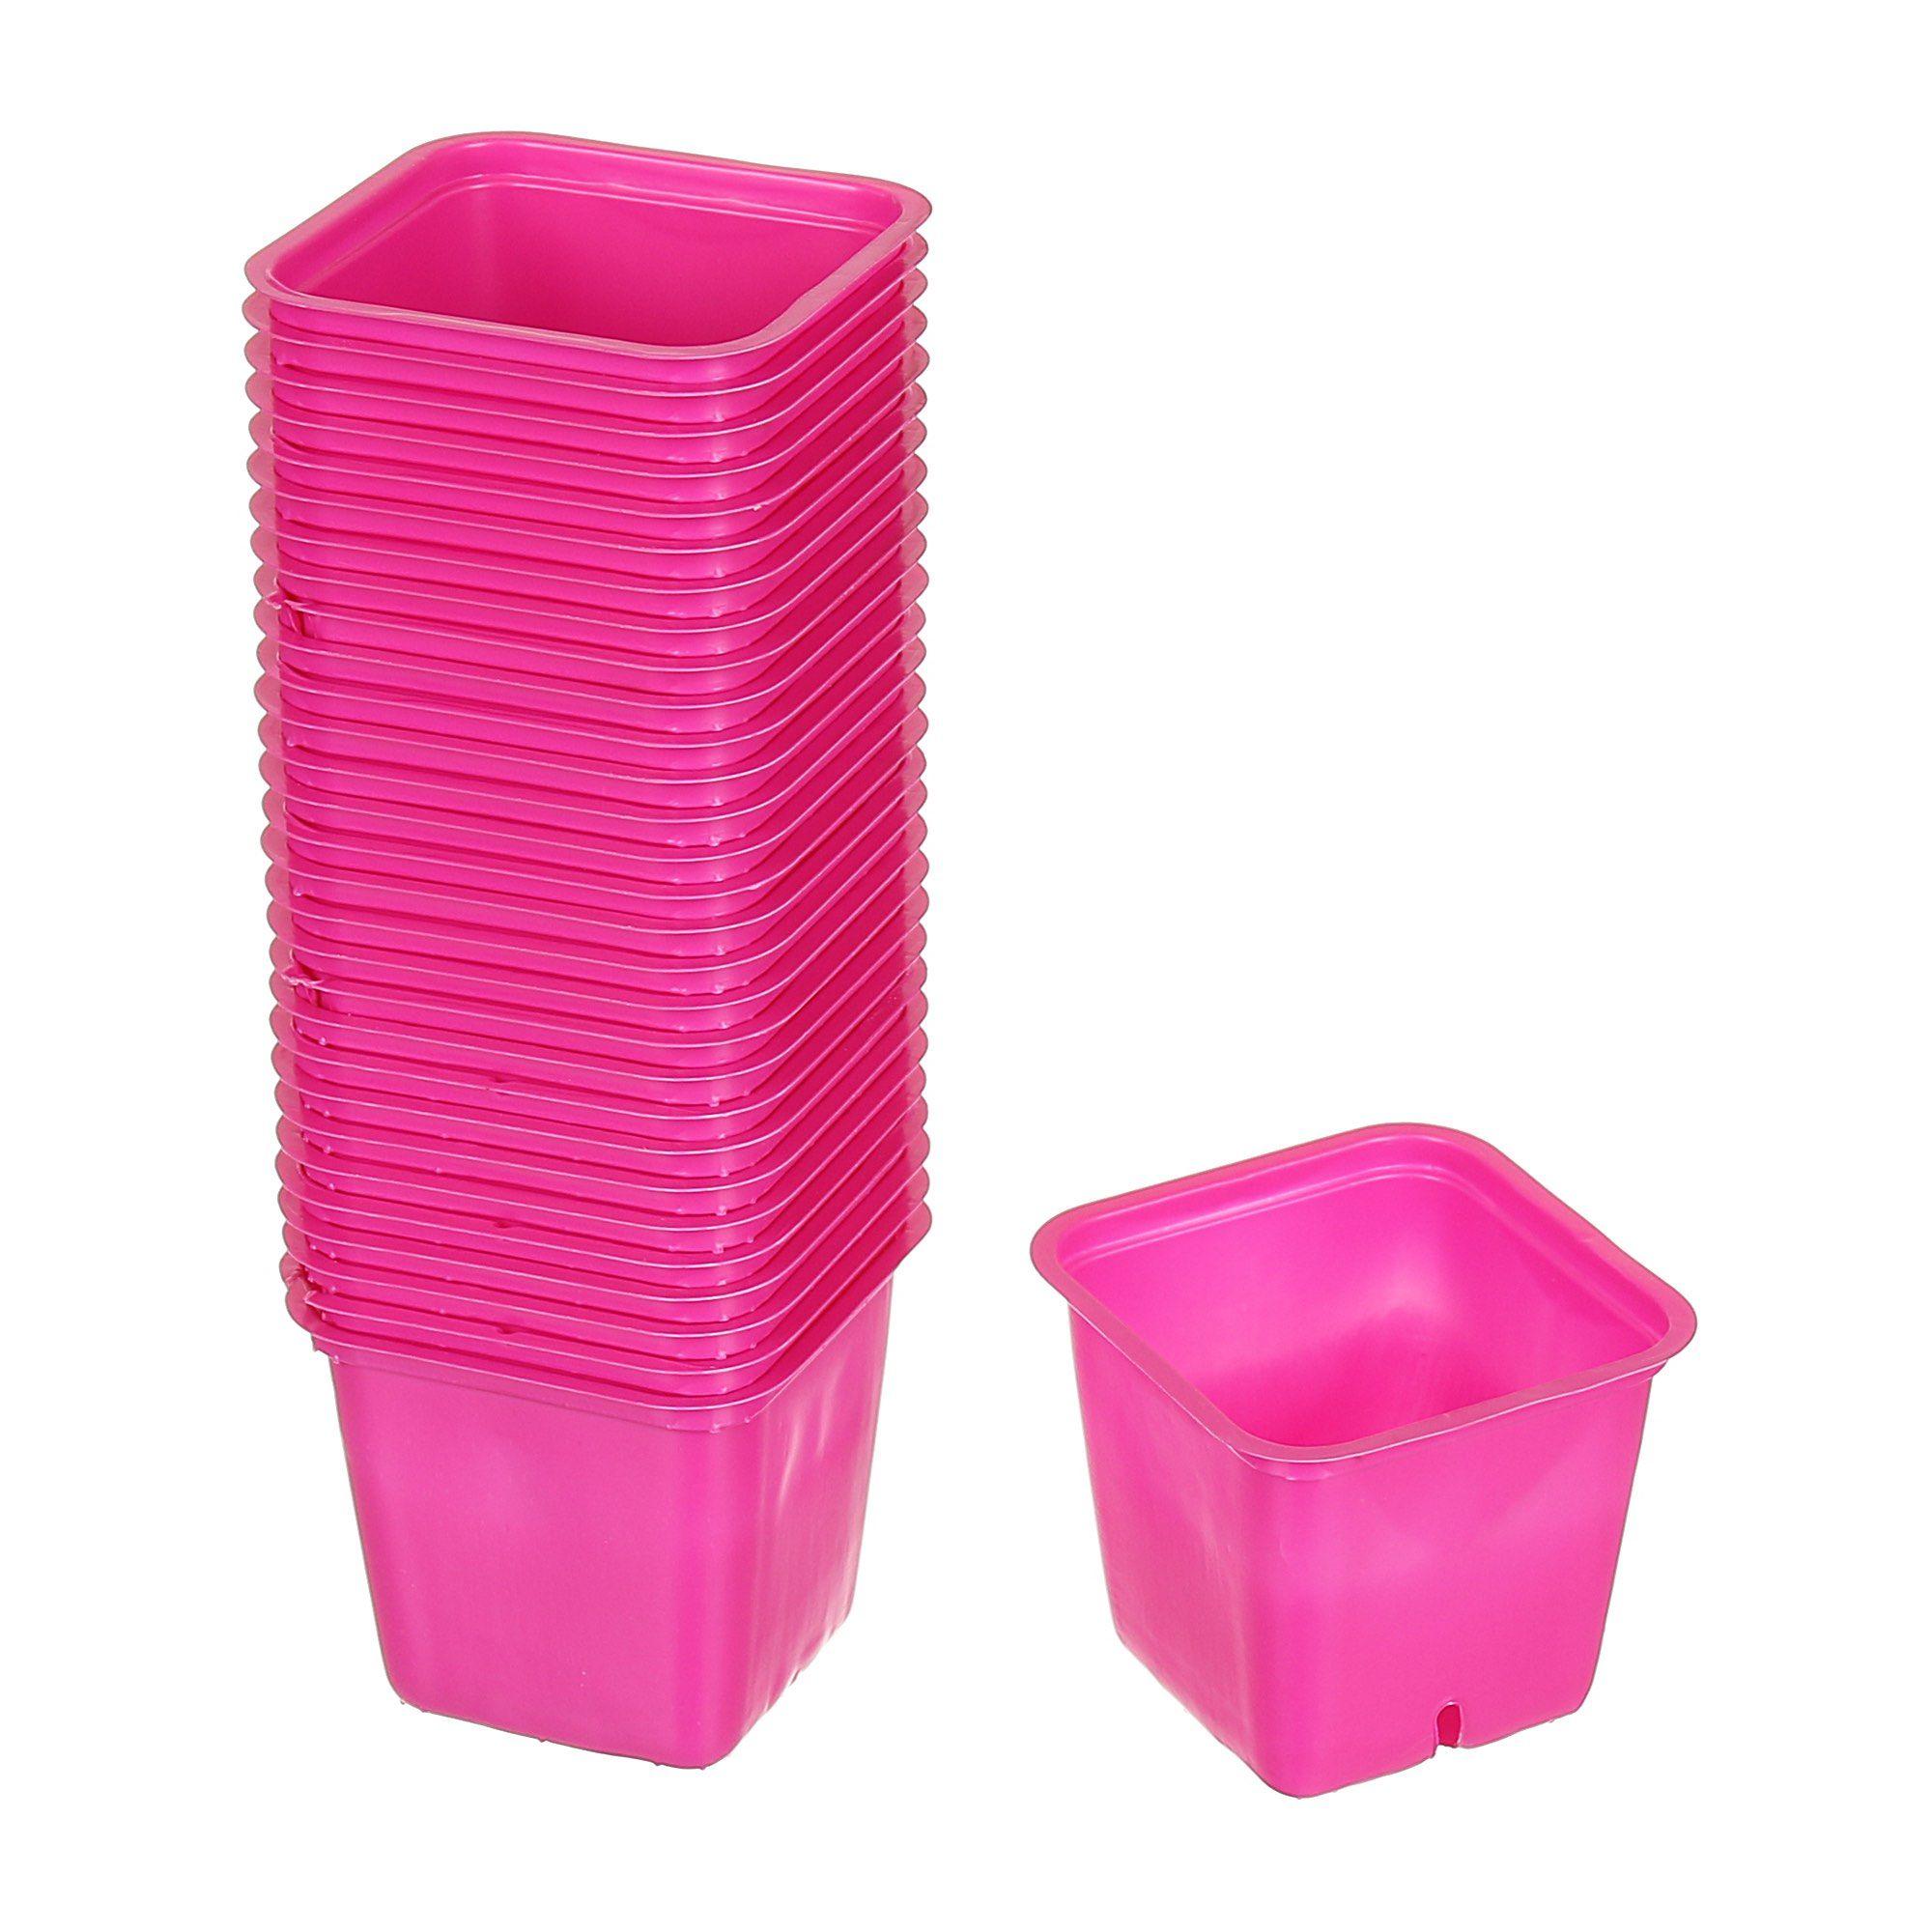 Set 30 buc ghiveci roz pentru rasad 6 x 6 cm